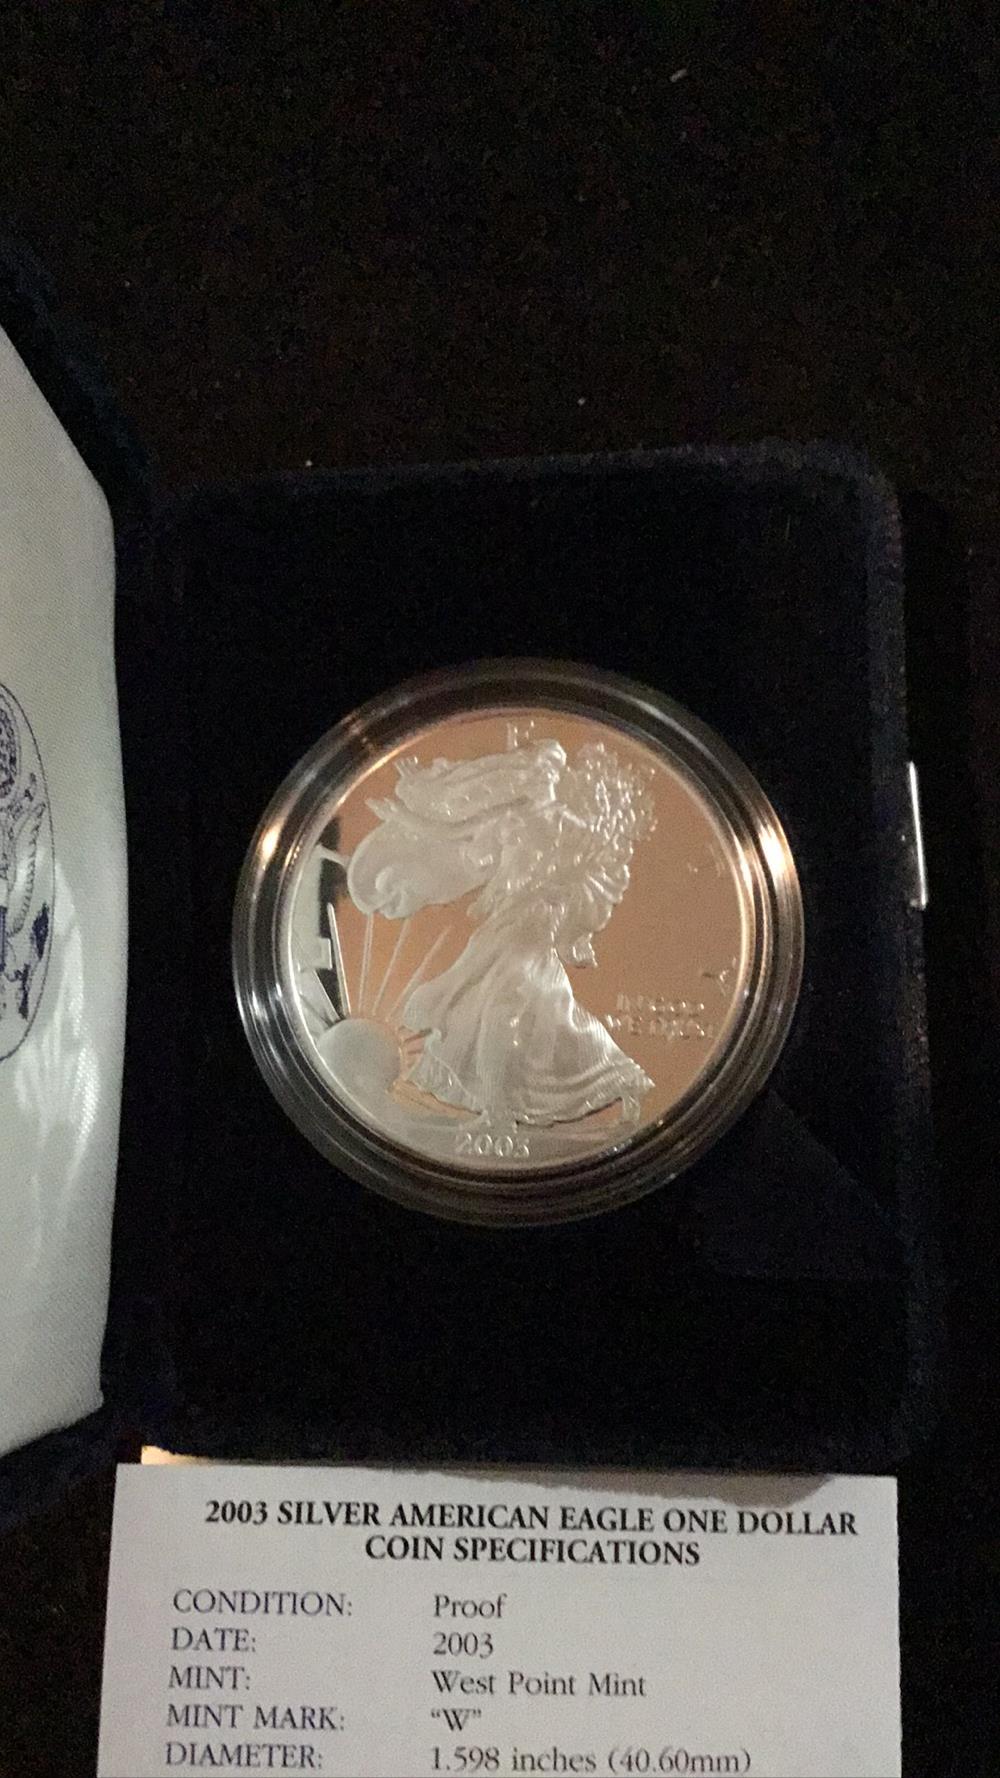 Lot 164: American eagle 1 ounce proof silver bullion coin